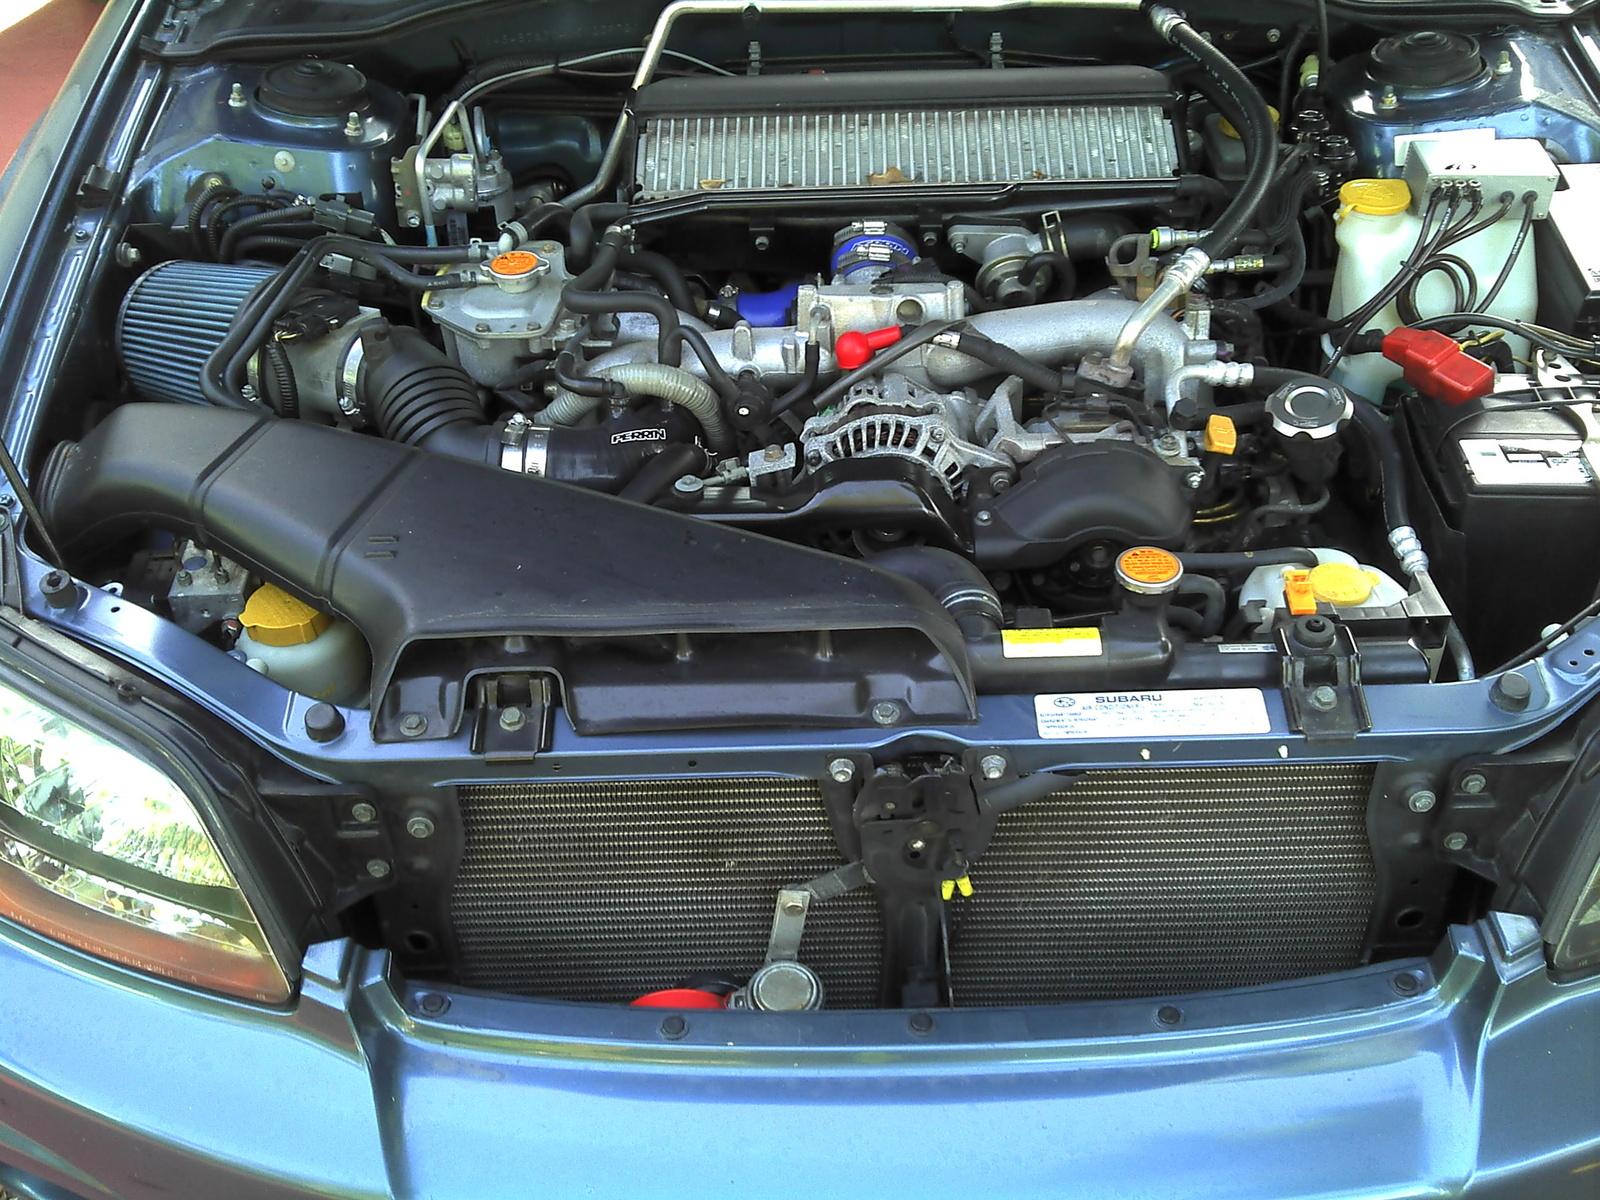 2006 Subaru Baja - Pictures